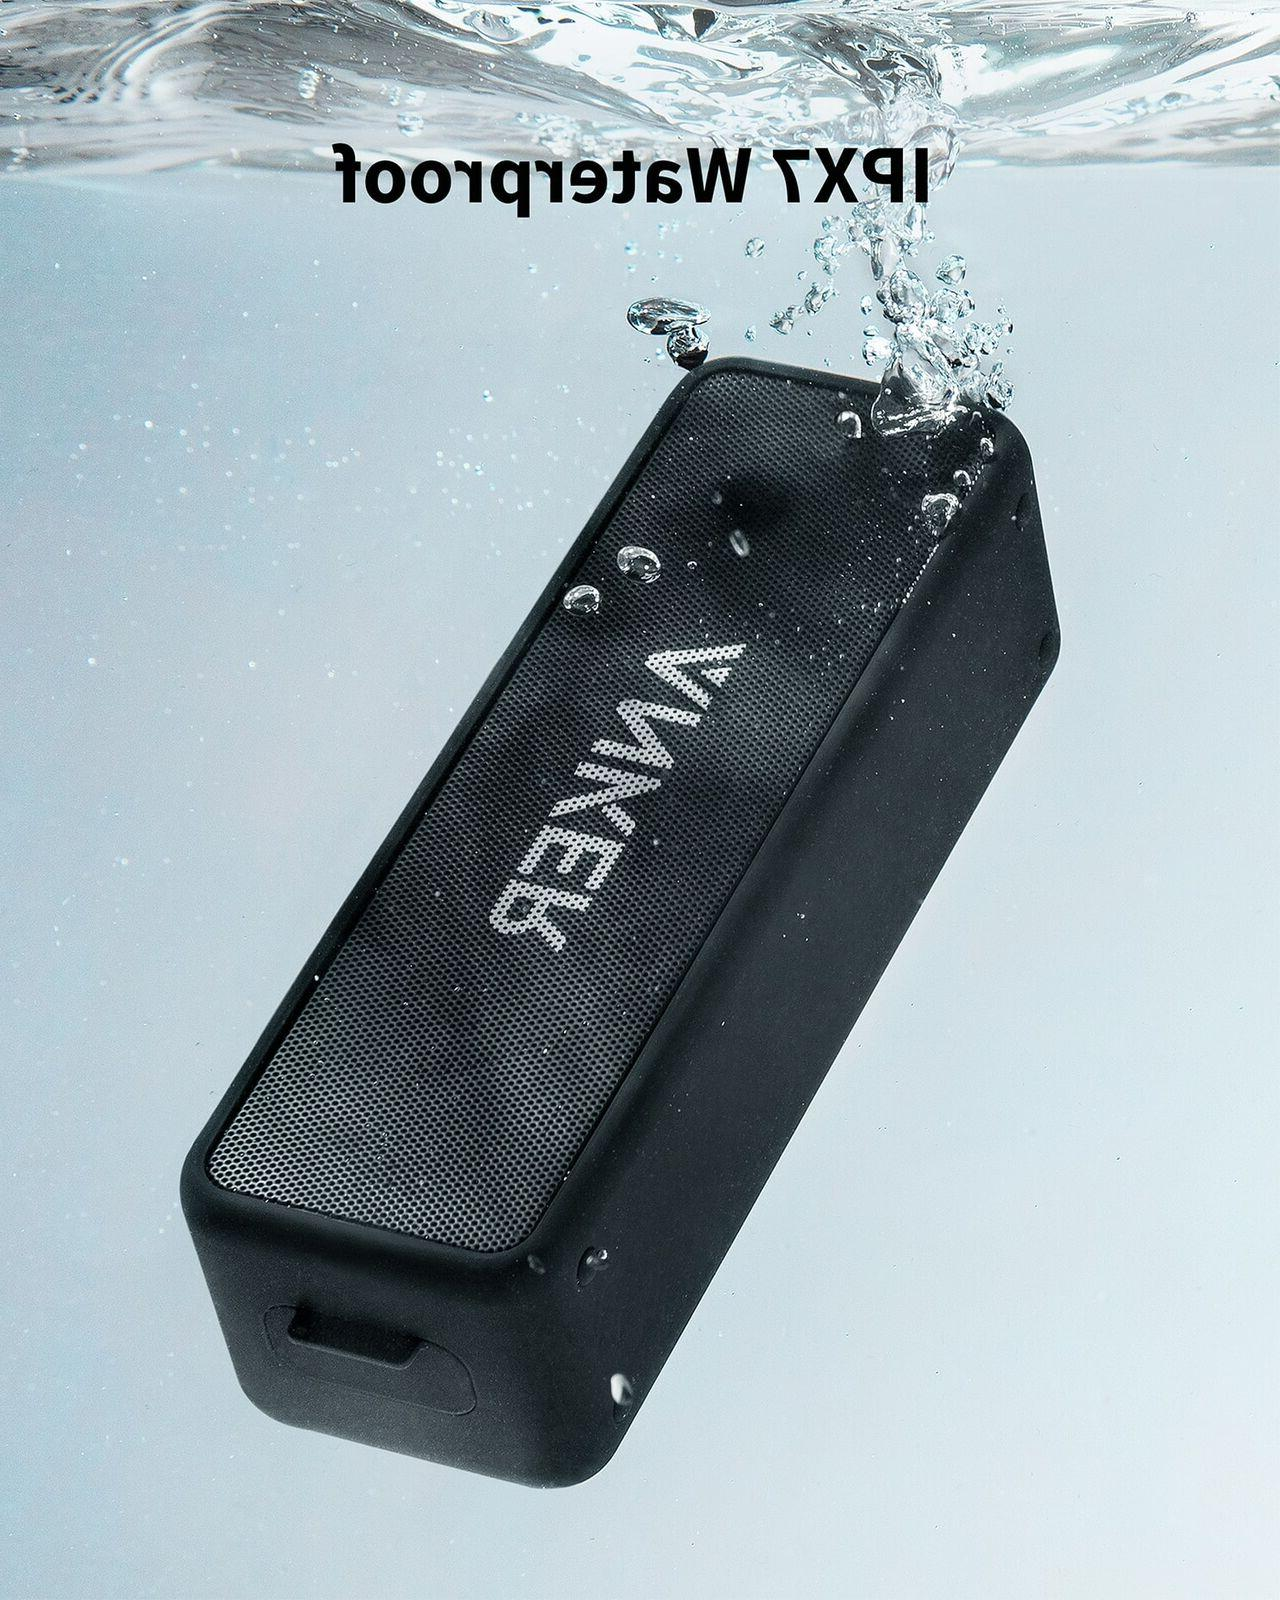 Anker Soundcore 2 Portable Speaker 12W 5.0 Bassup Wireless